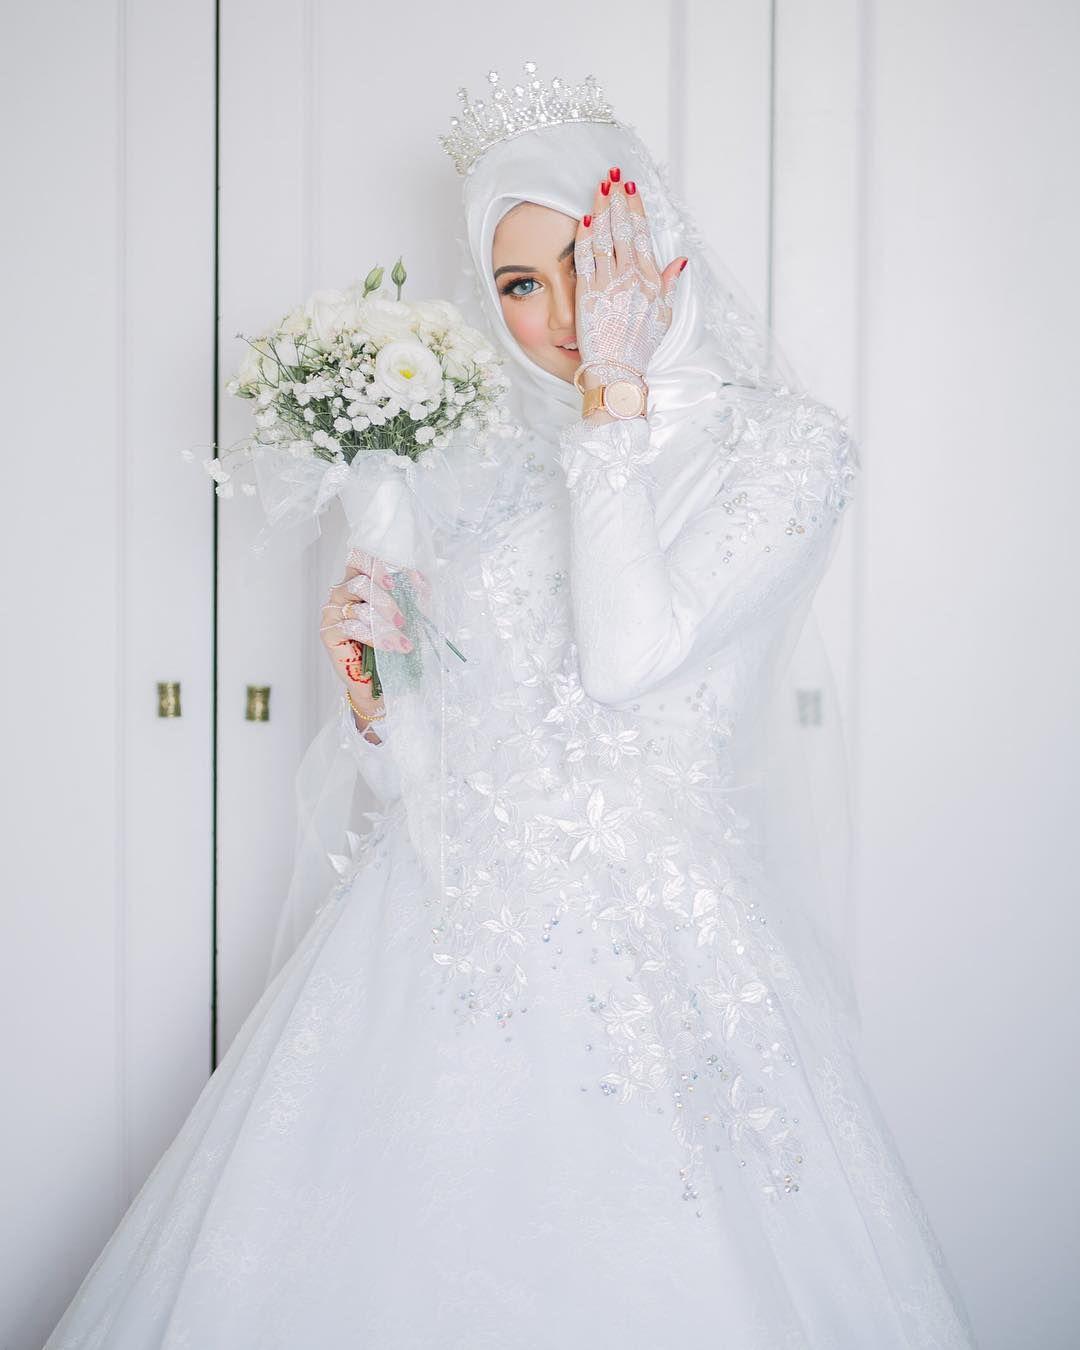 Cakk Adykasim Mekap Cantik By Kakak Cantik Fiqahafizi Gambar Cantik By The Amazing Am Gaun Pengantin Sederhana Gaun Pengantin Putih Pakaian Pernikahan